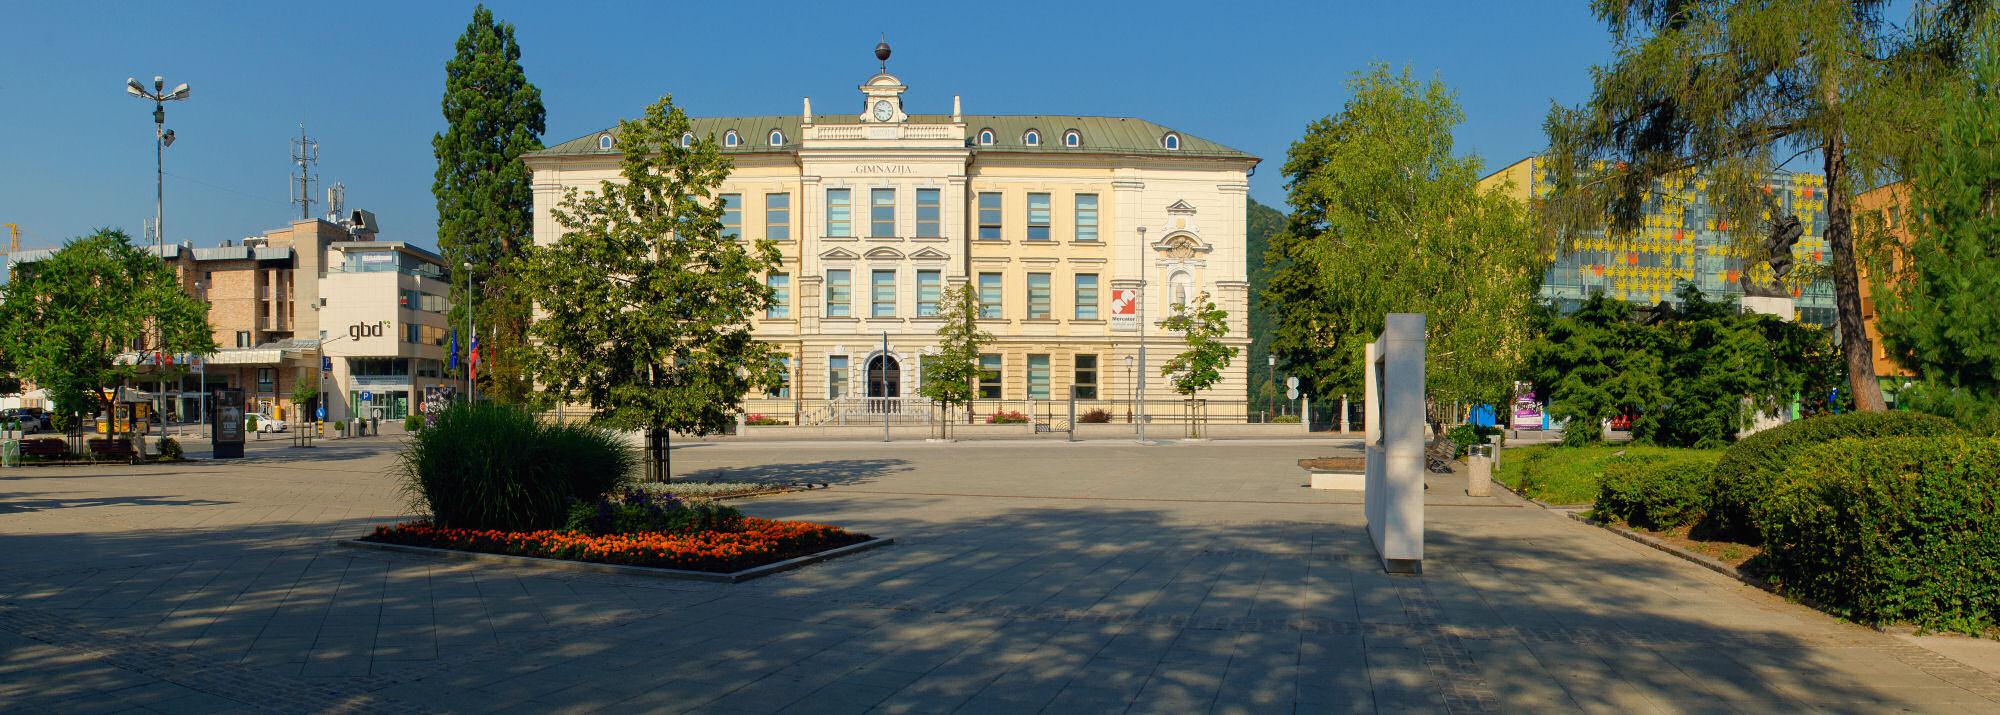 Gymnasium in Kranj, Slovenia